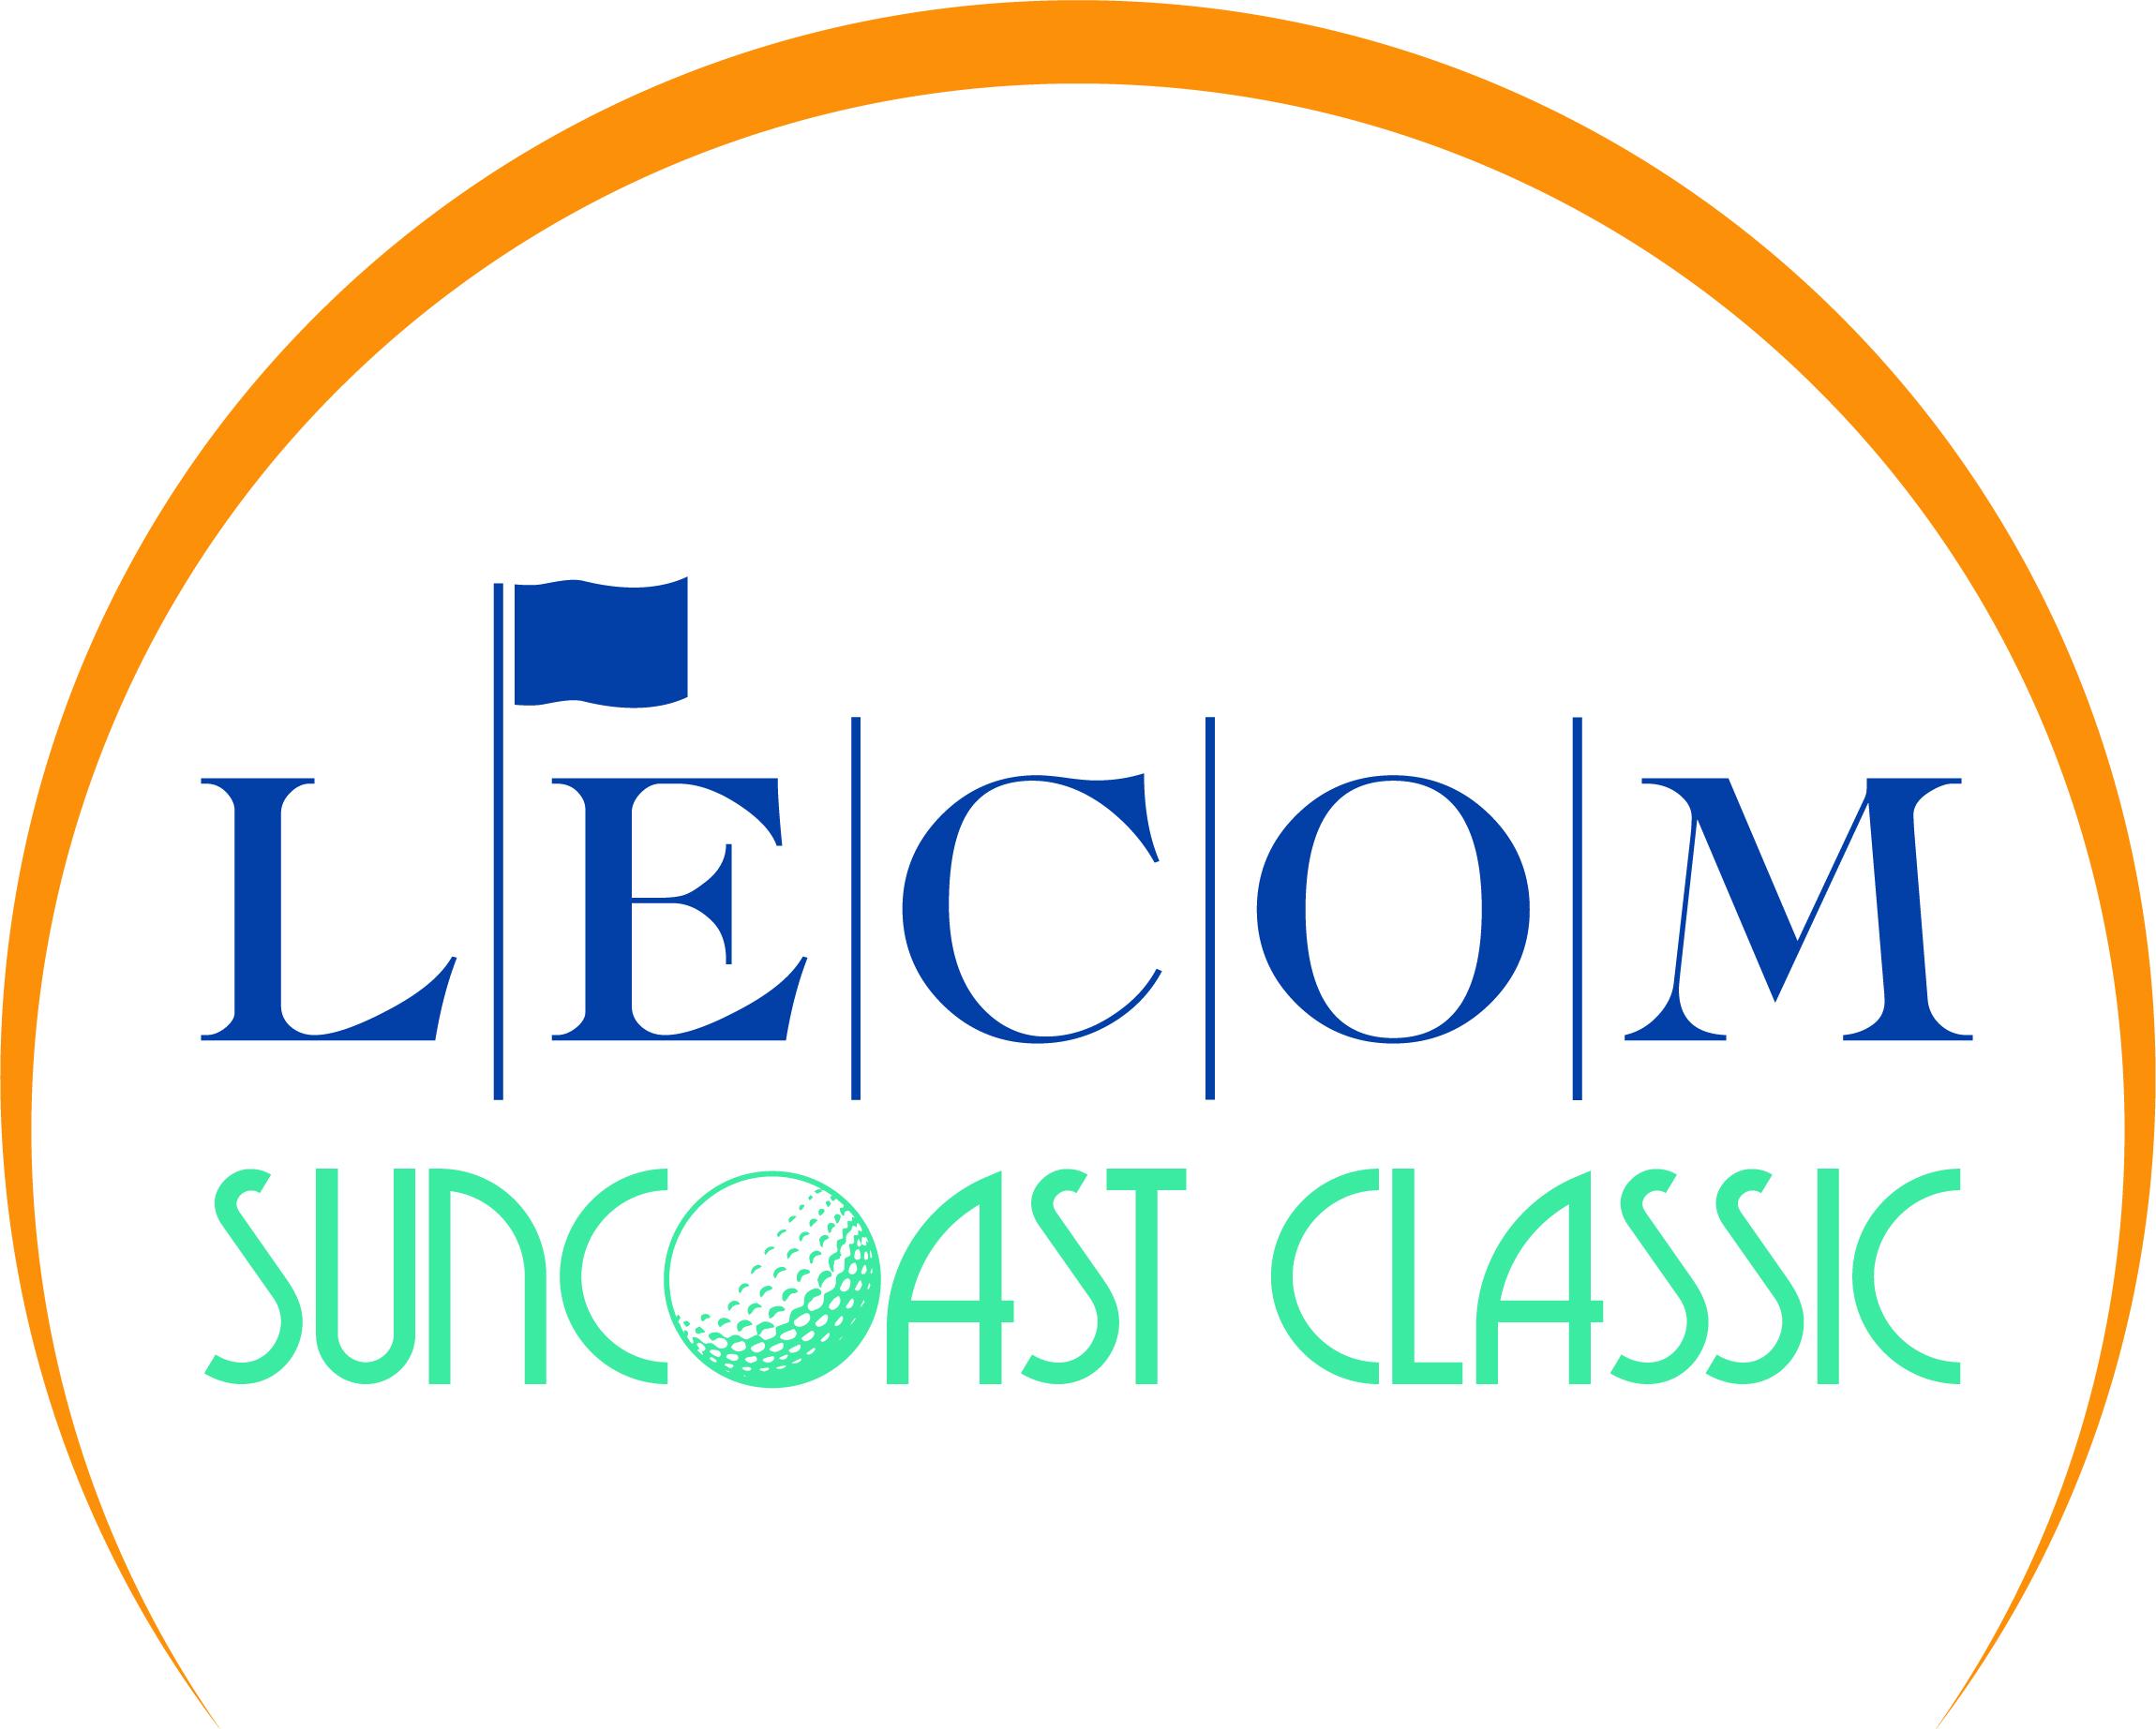 LECOM Suncoast Classic